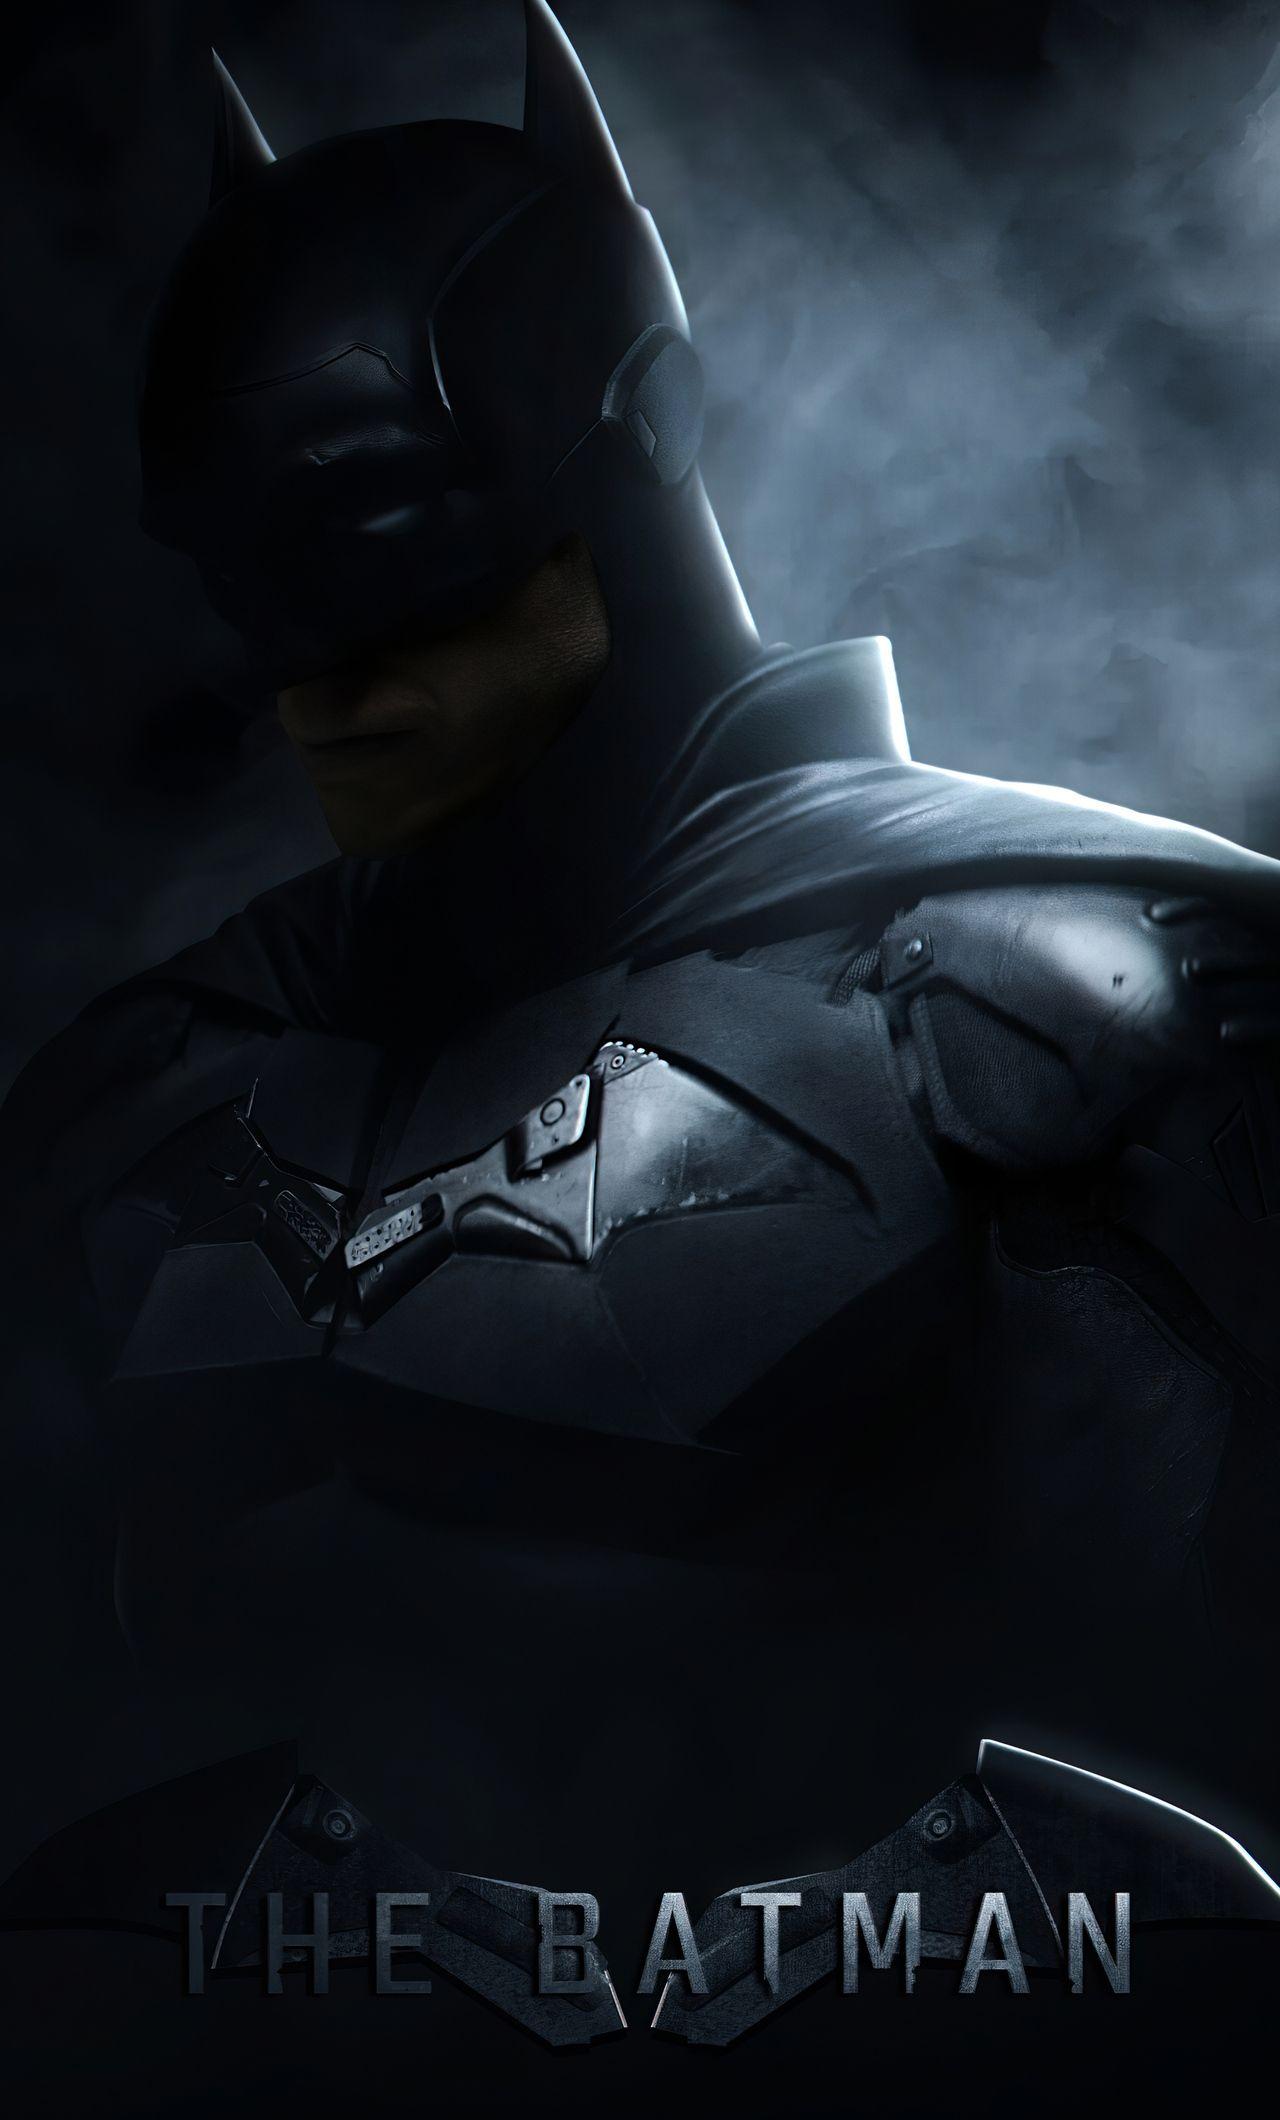 The Batman 2021 Logo Wallpapers 1280x2120